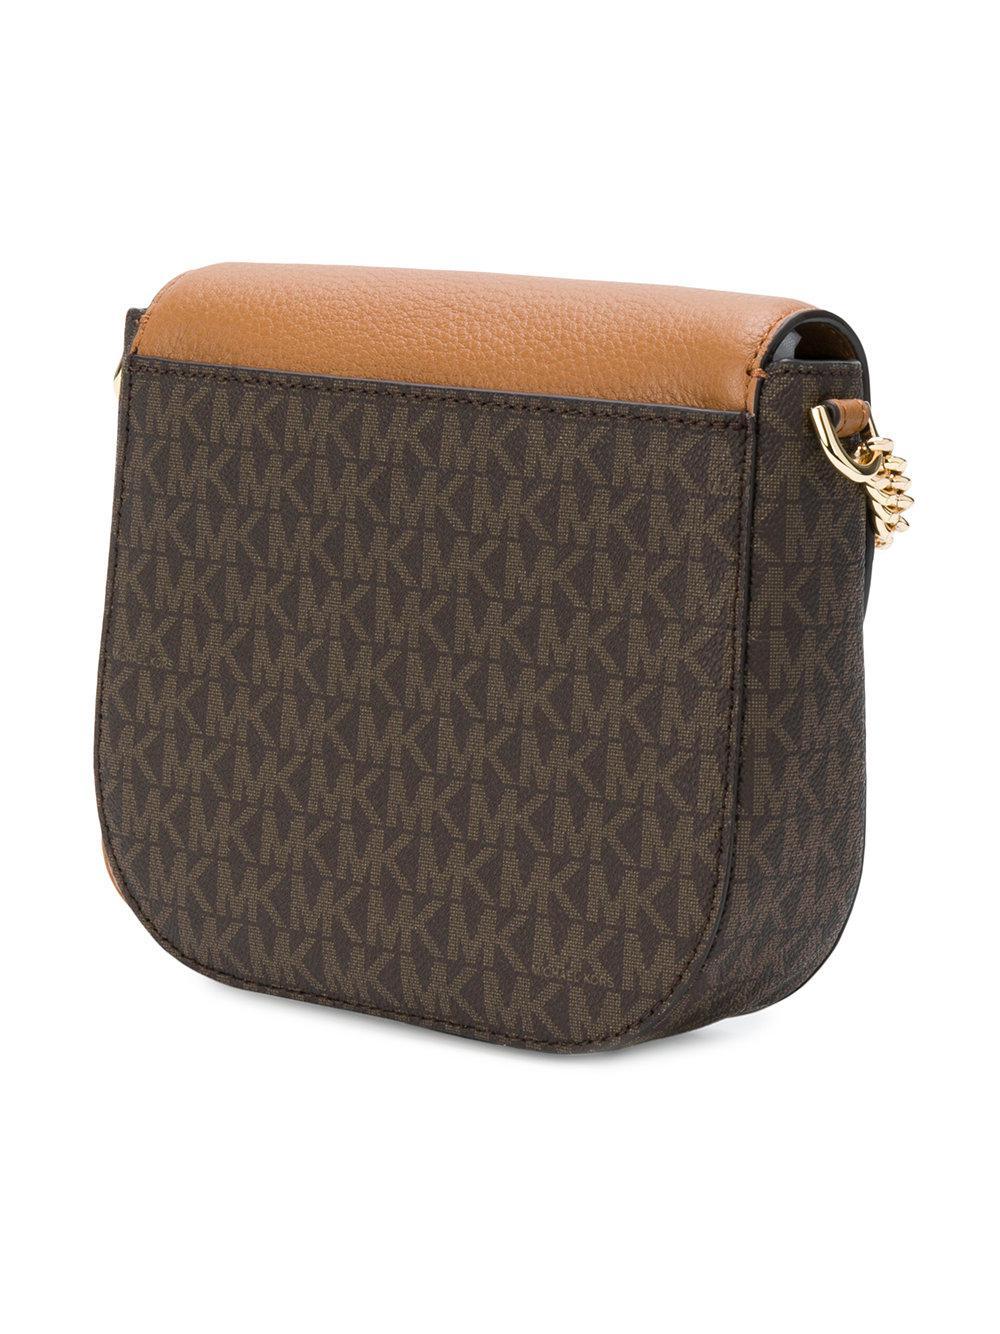 MICHAEL Michael Kors Synthetic Half-dome Logo Crossbody Bag in Brown